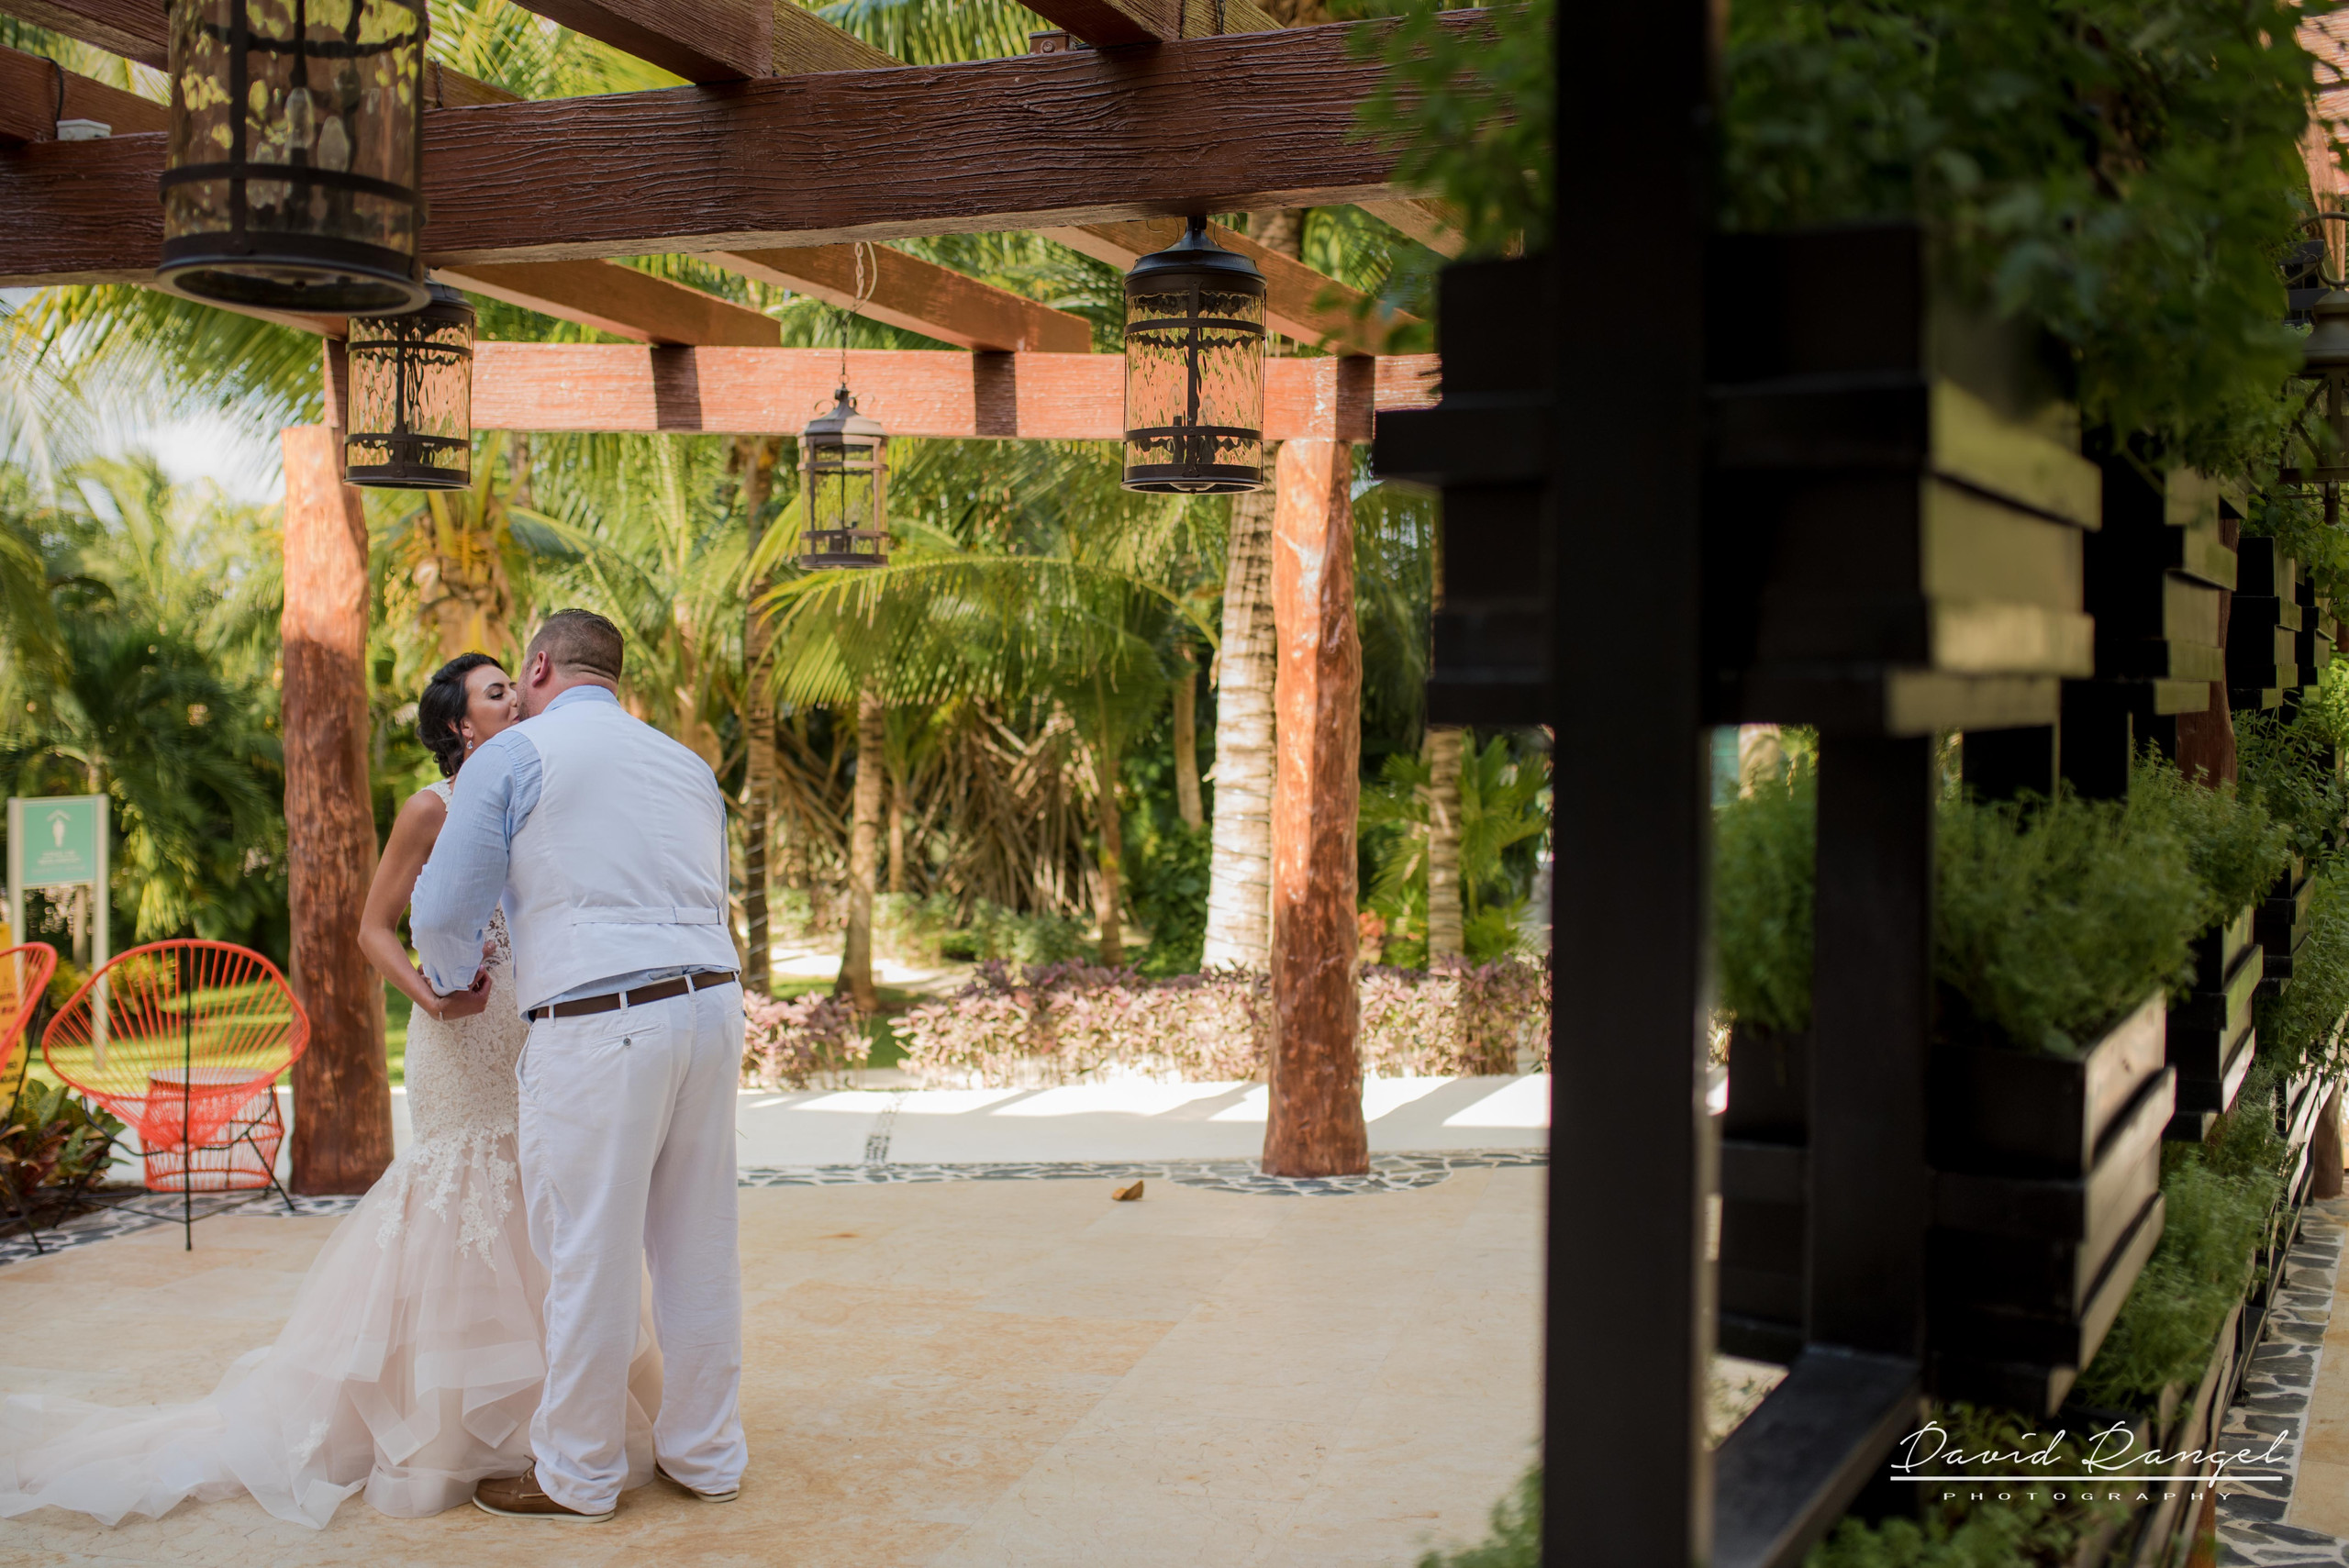 firstlook+bride+groom+to+be+couple+kiss